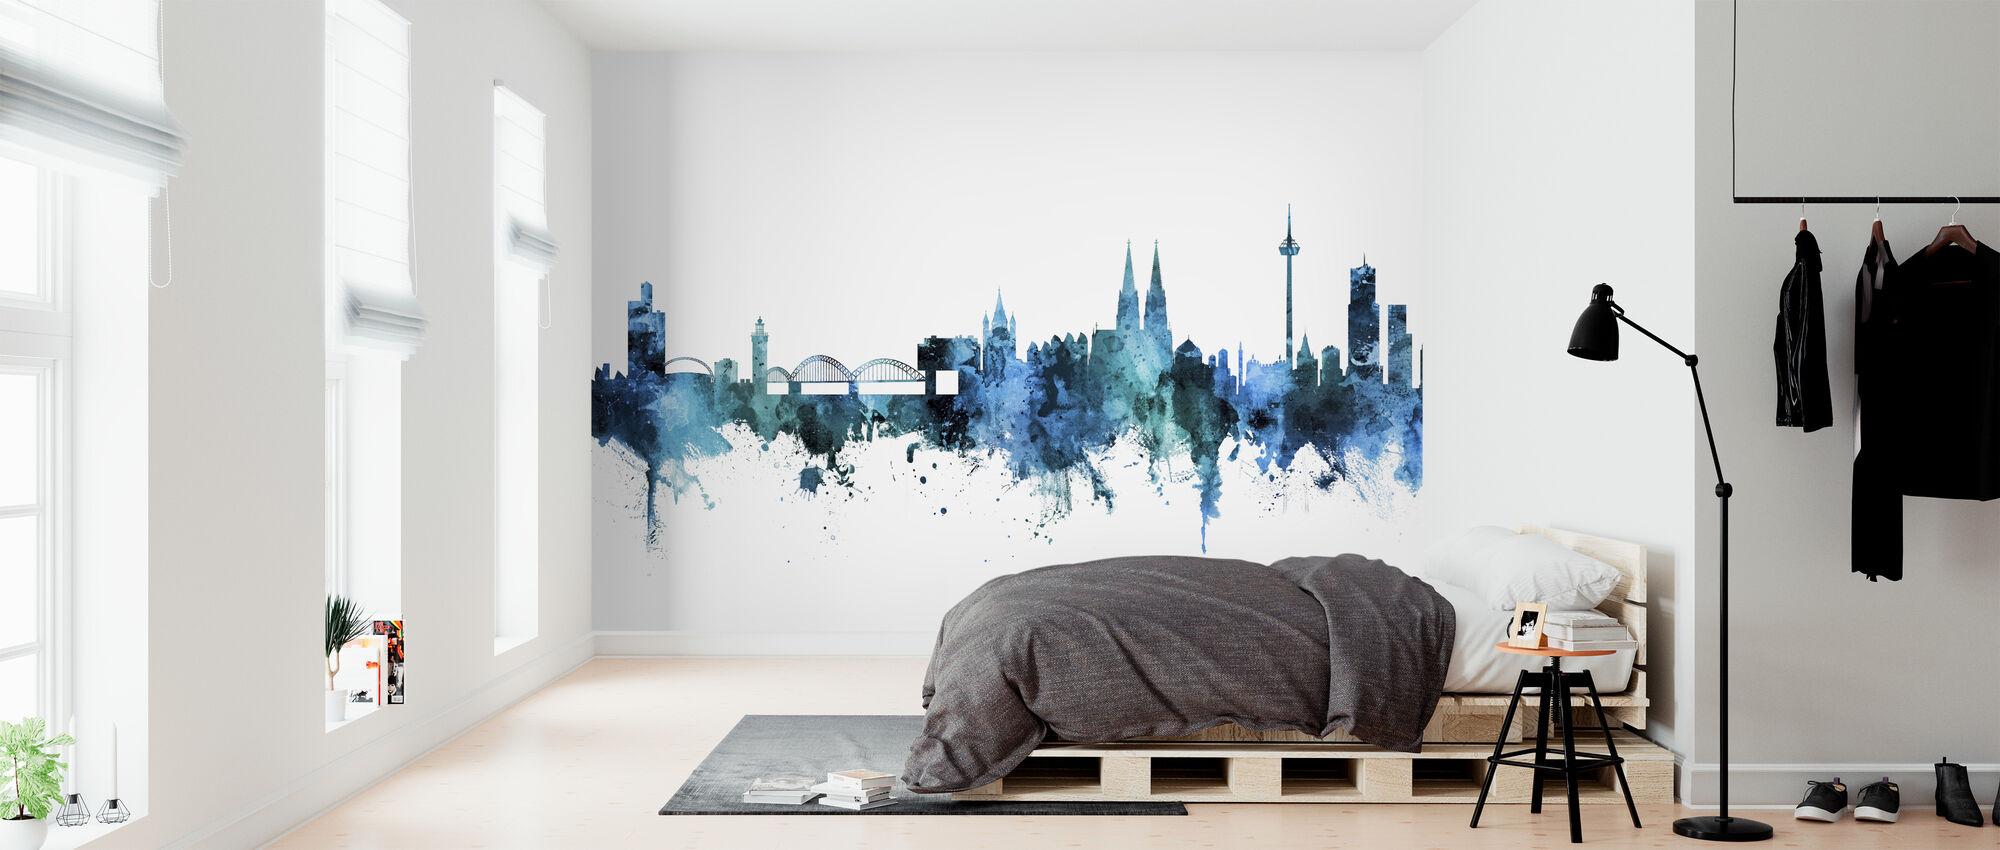 Cologne Germany Skyline - Wallpaper - Bedroom